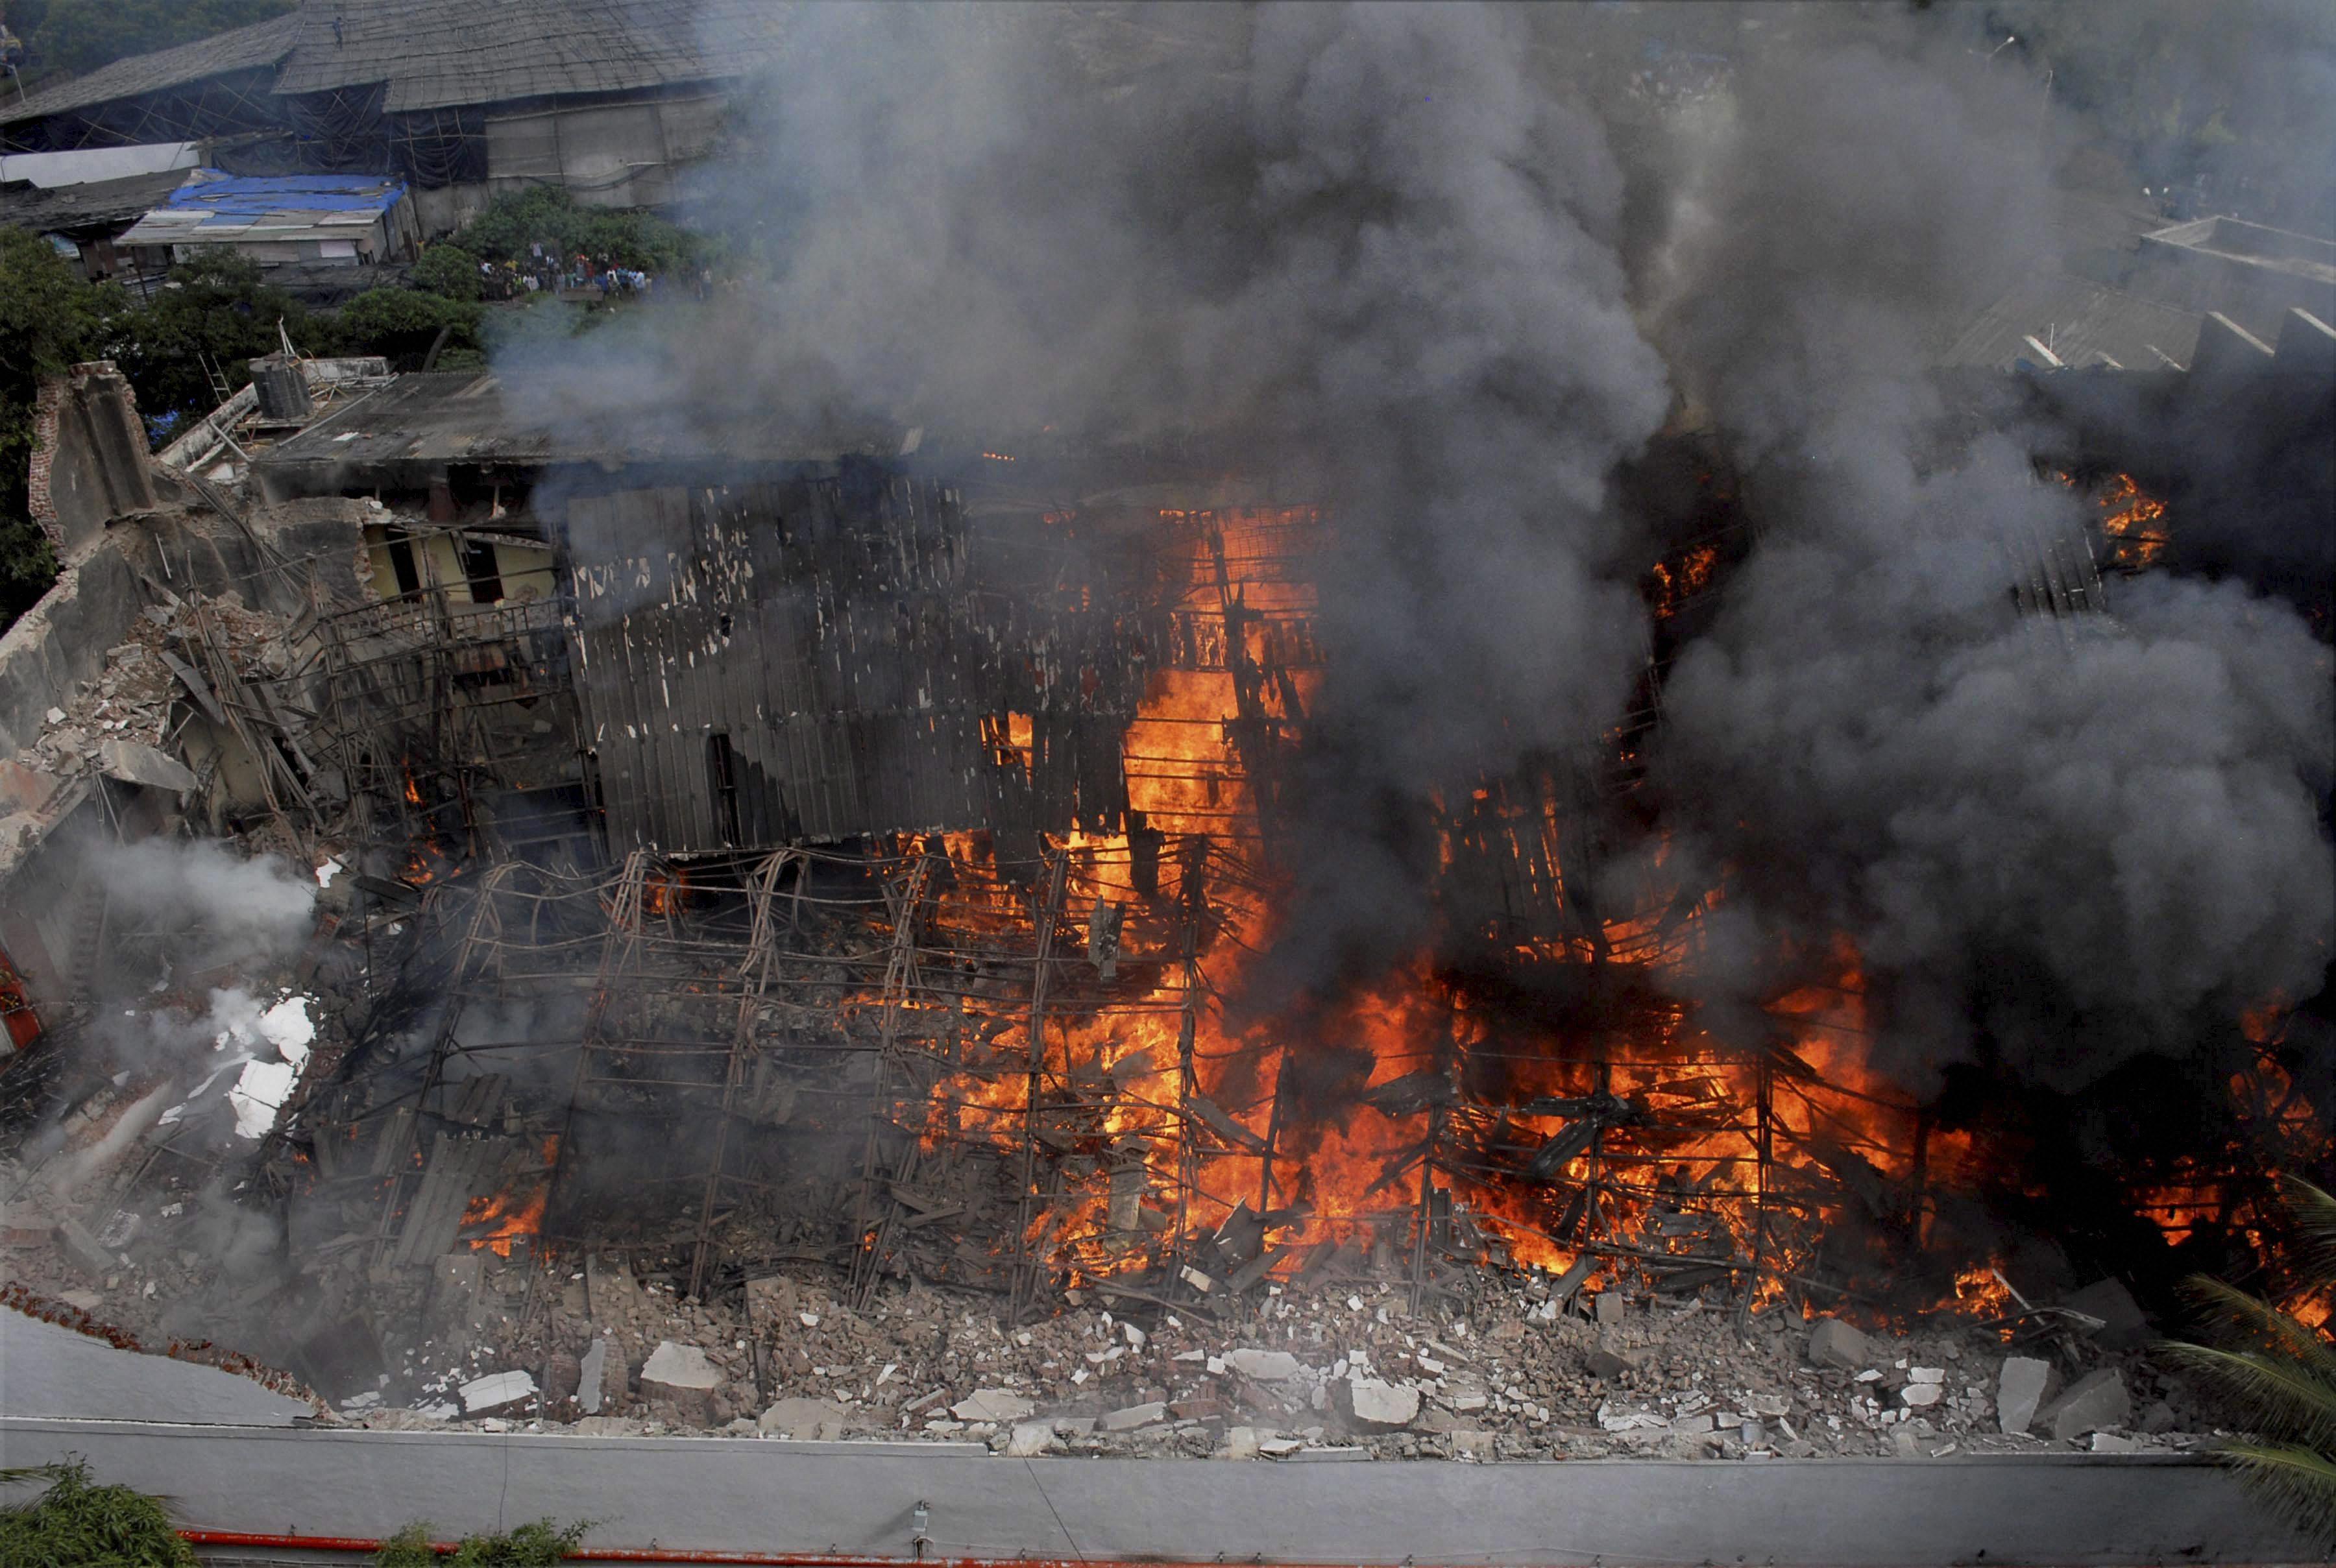 Major fire at iconic R K Studio in Mumbai